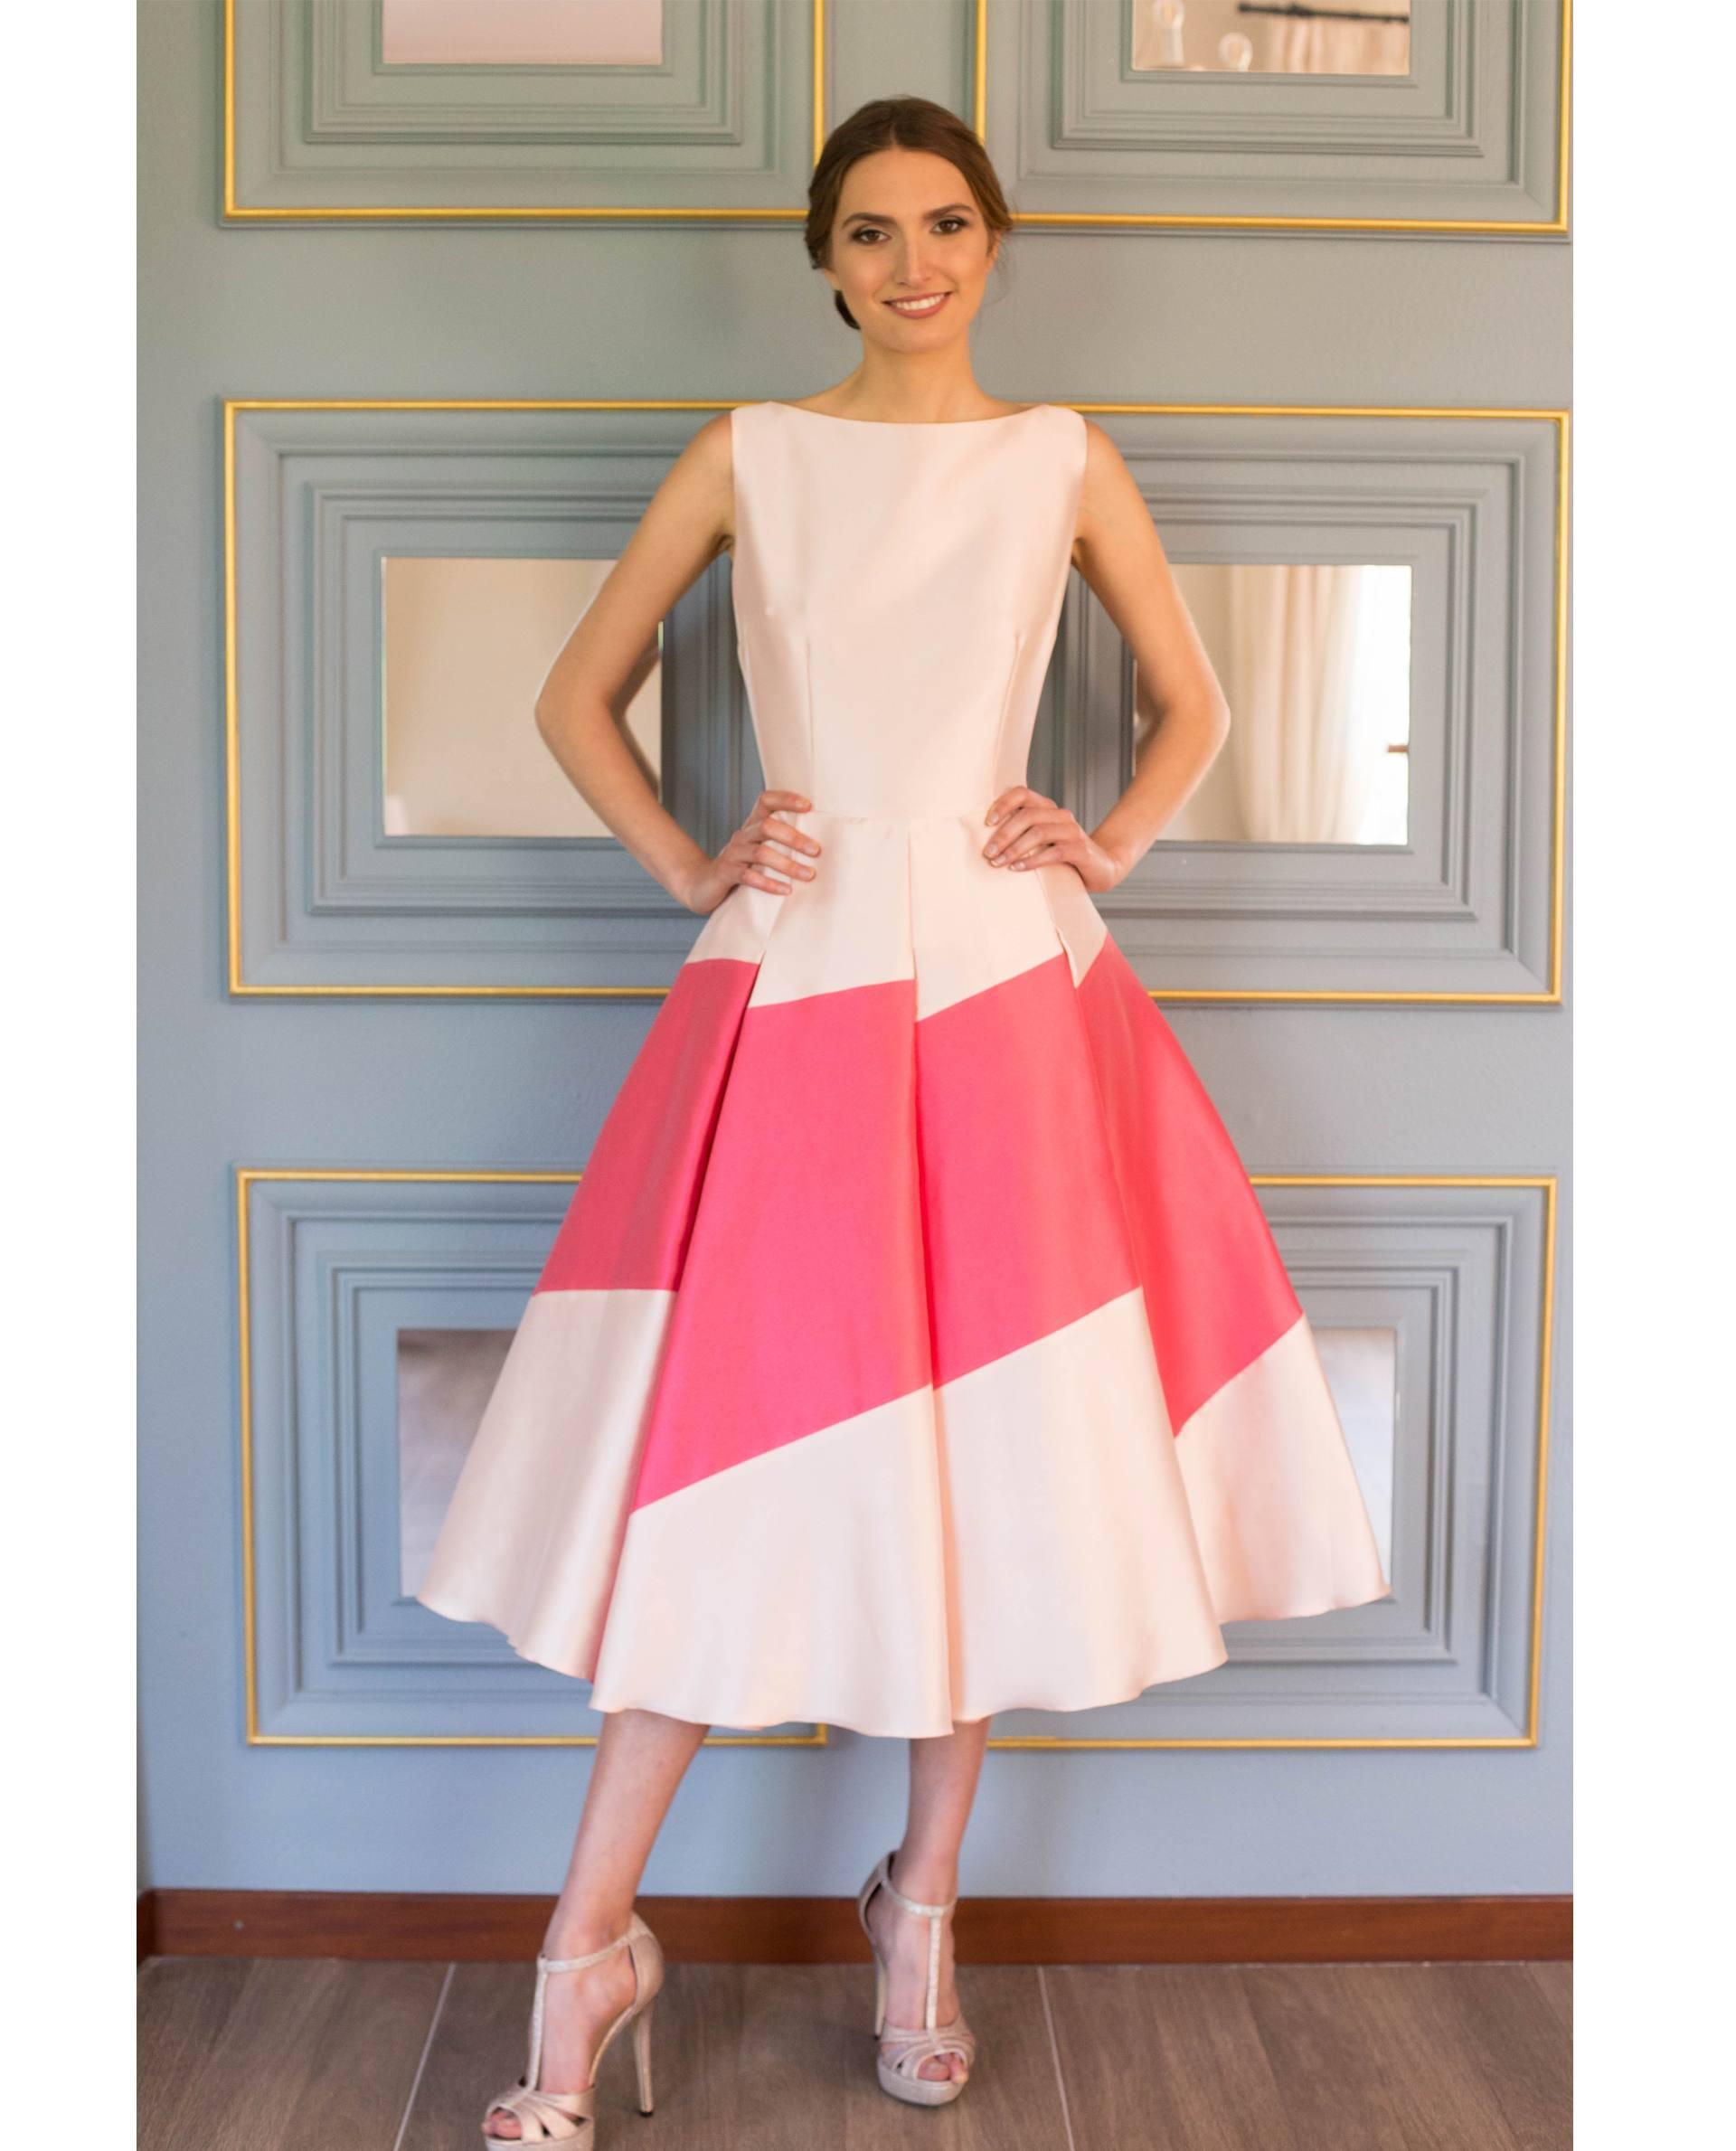 ATELIER-NATURE 2017/18 - VESTIDOS - vestido fiesta ANNIE rosa